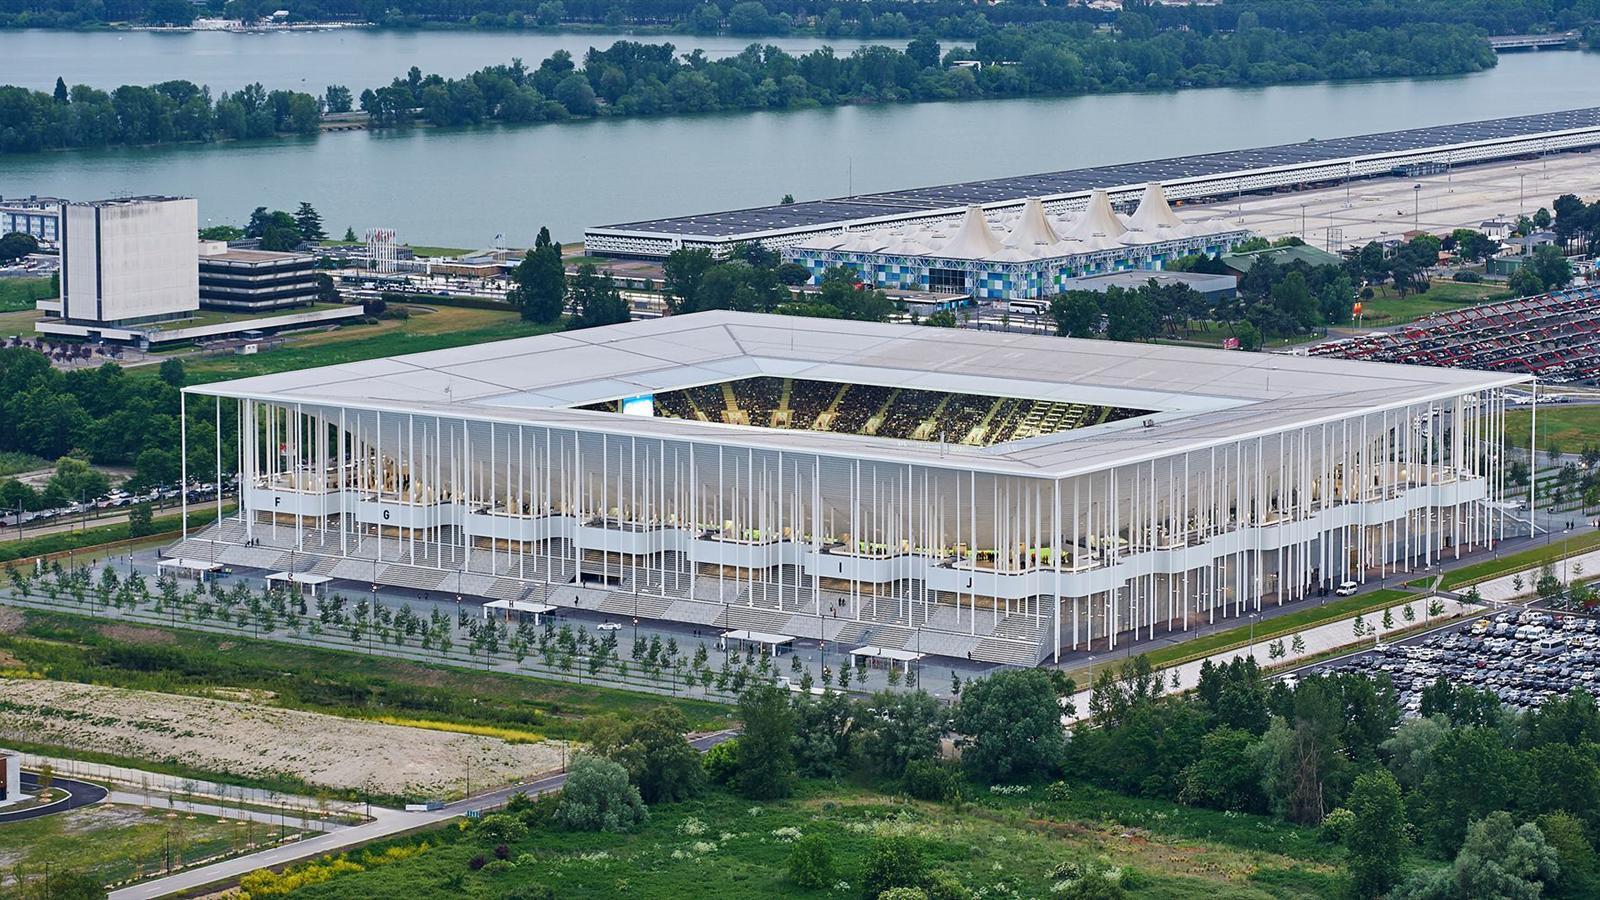 Le Matmut Atlantique 233 Lu Stade International De 2015